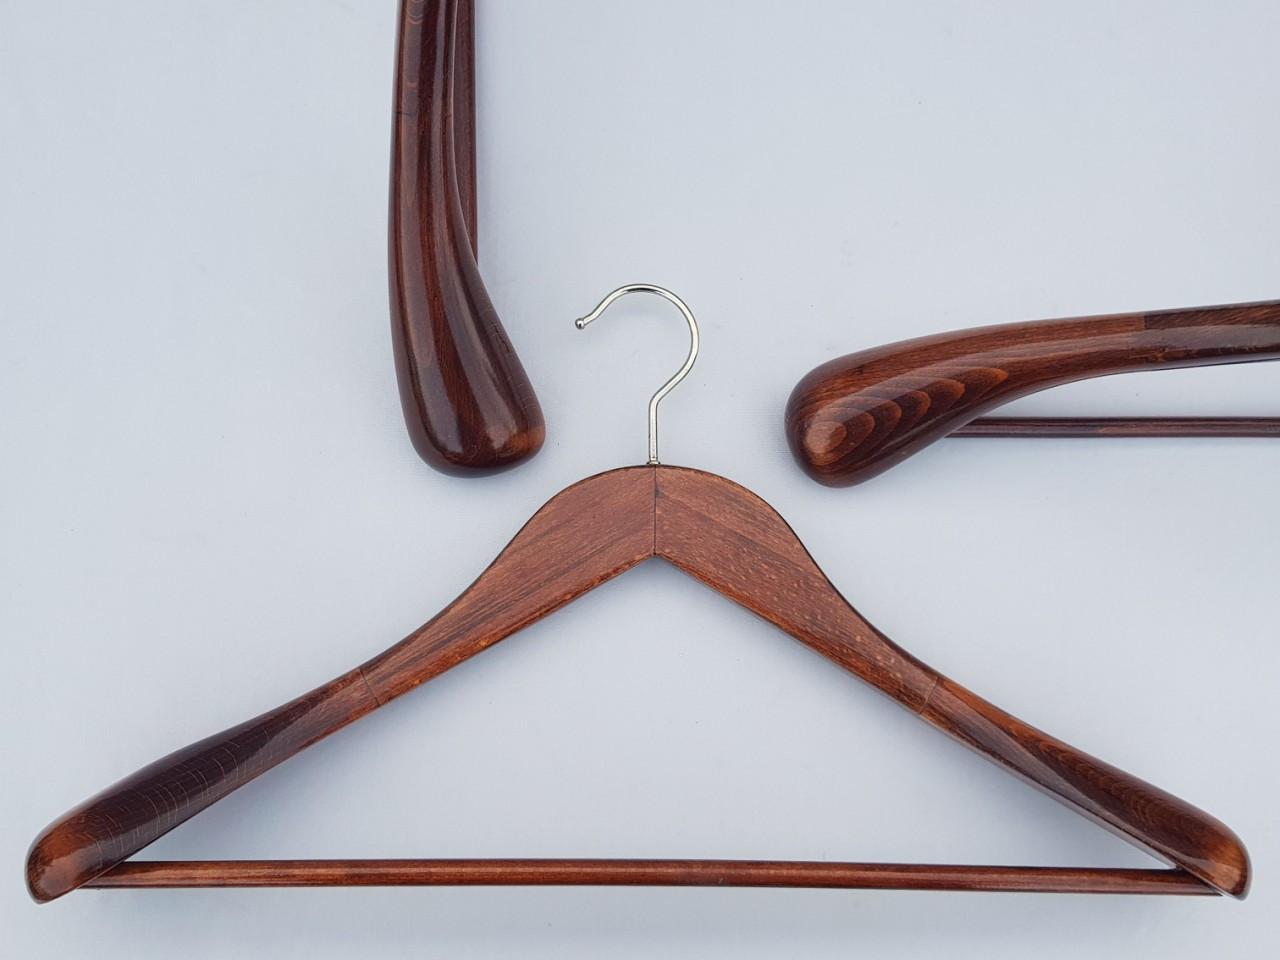 Плечики вешалки деревянные Mainetti коричневого цвета, 45 см